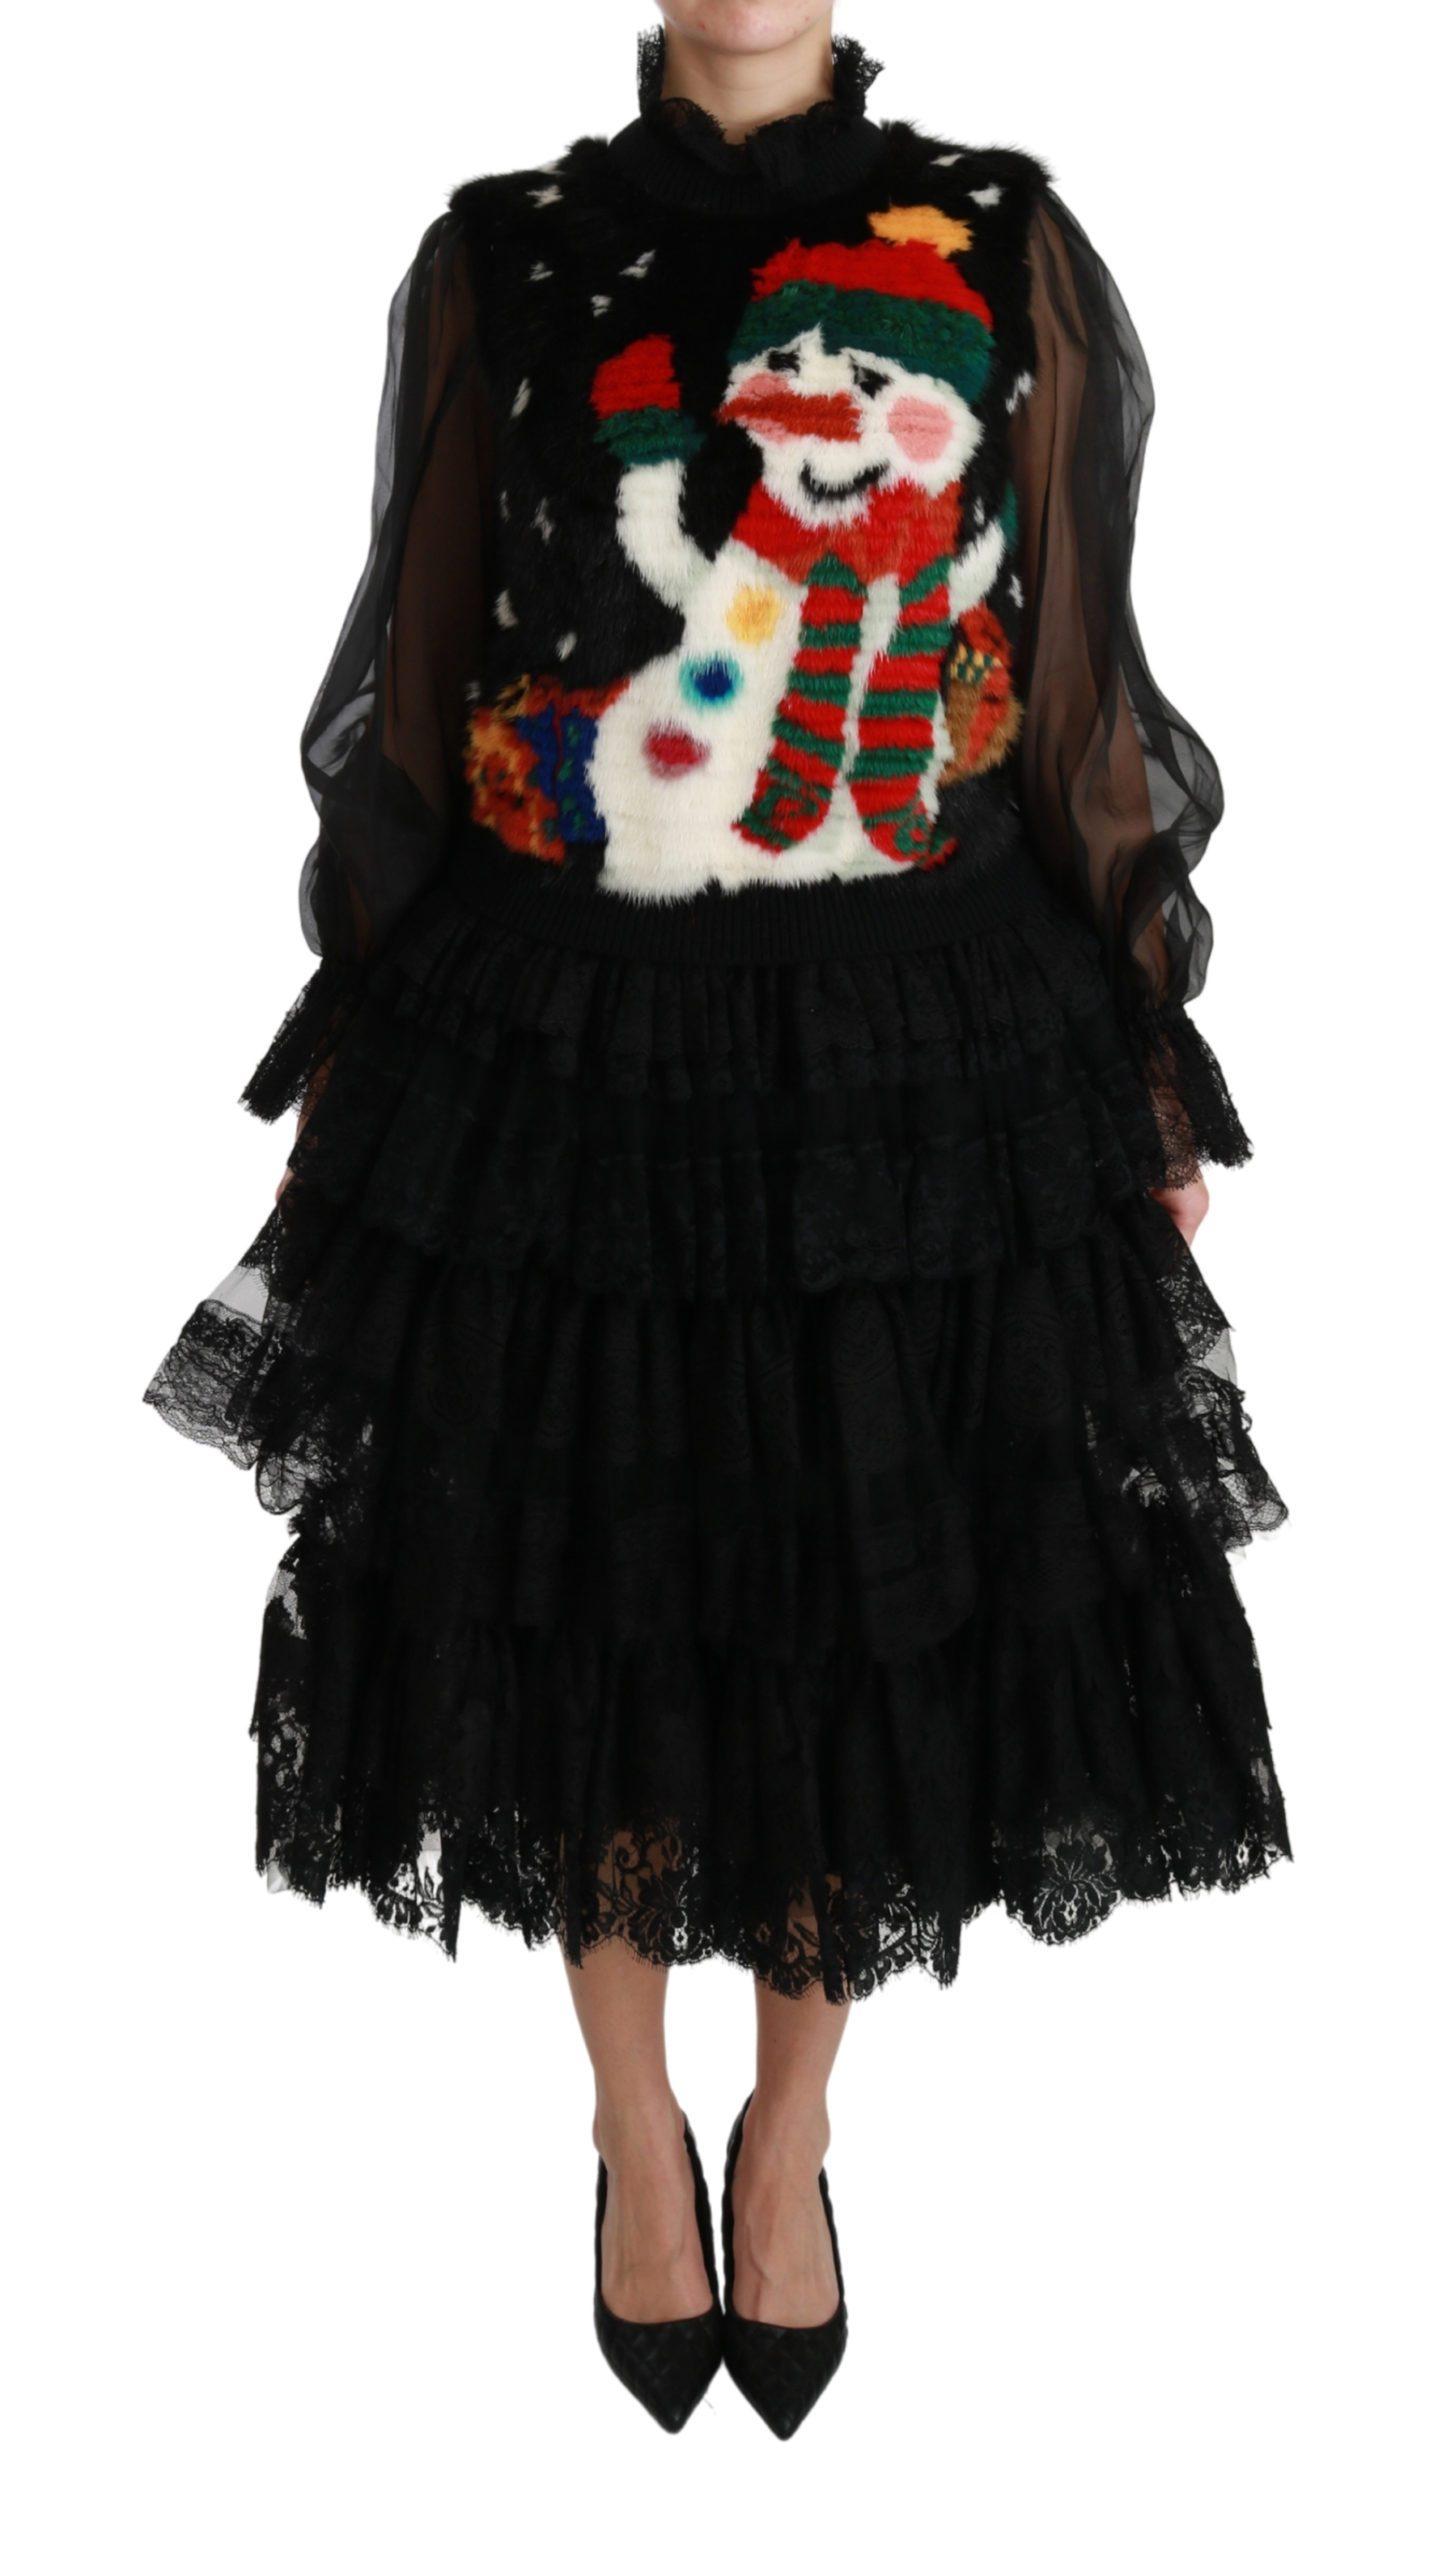 Dolce & Gabbana Women's Snowman Lace Layered Dress Black DR2509 - IT40|S